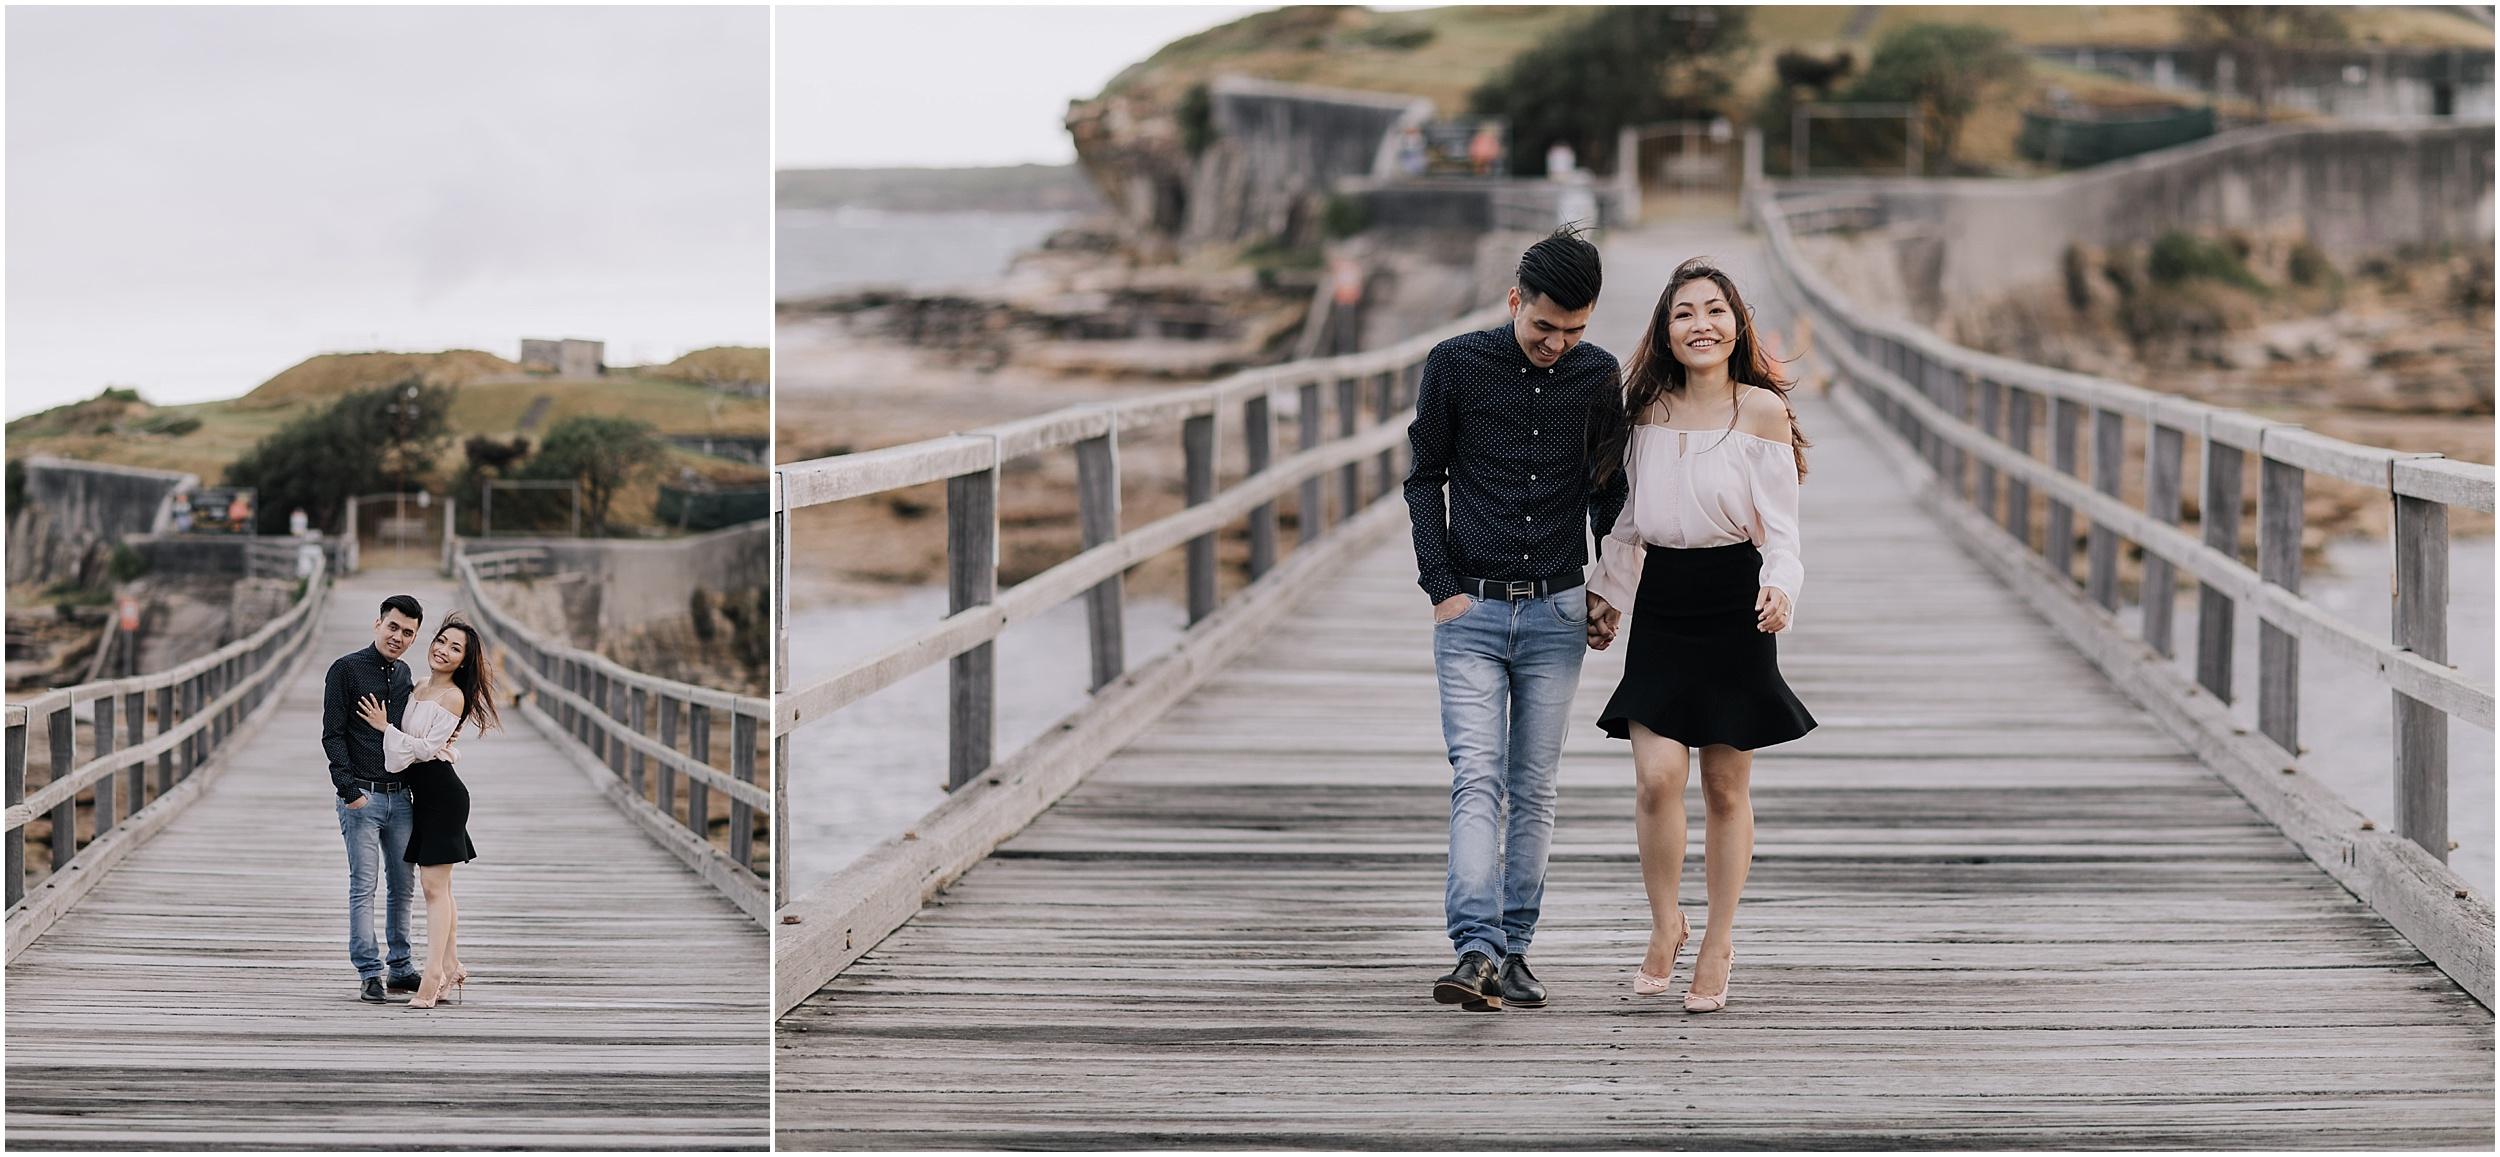 Sydney Pre-Wedding Engagement Photos La Perouse 6